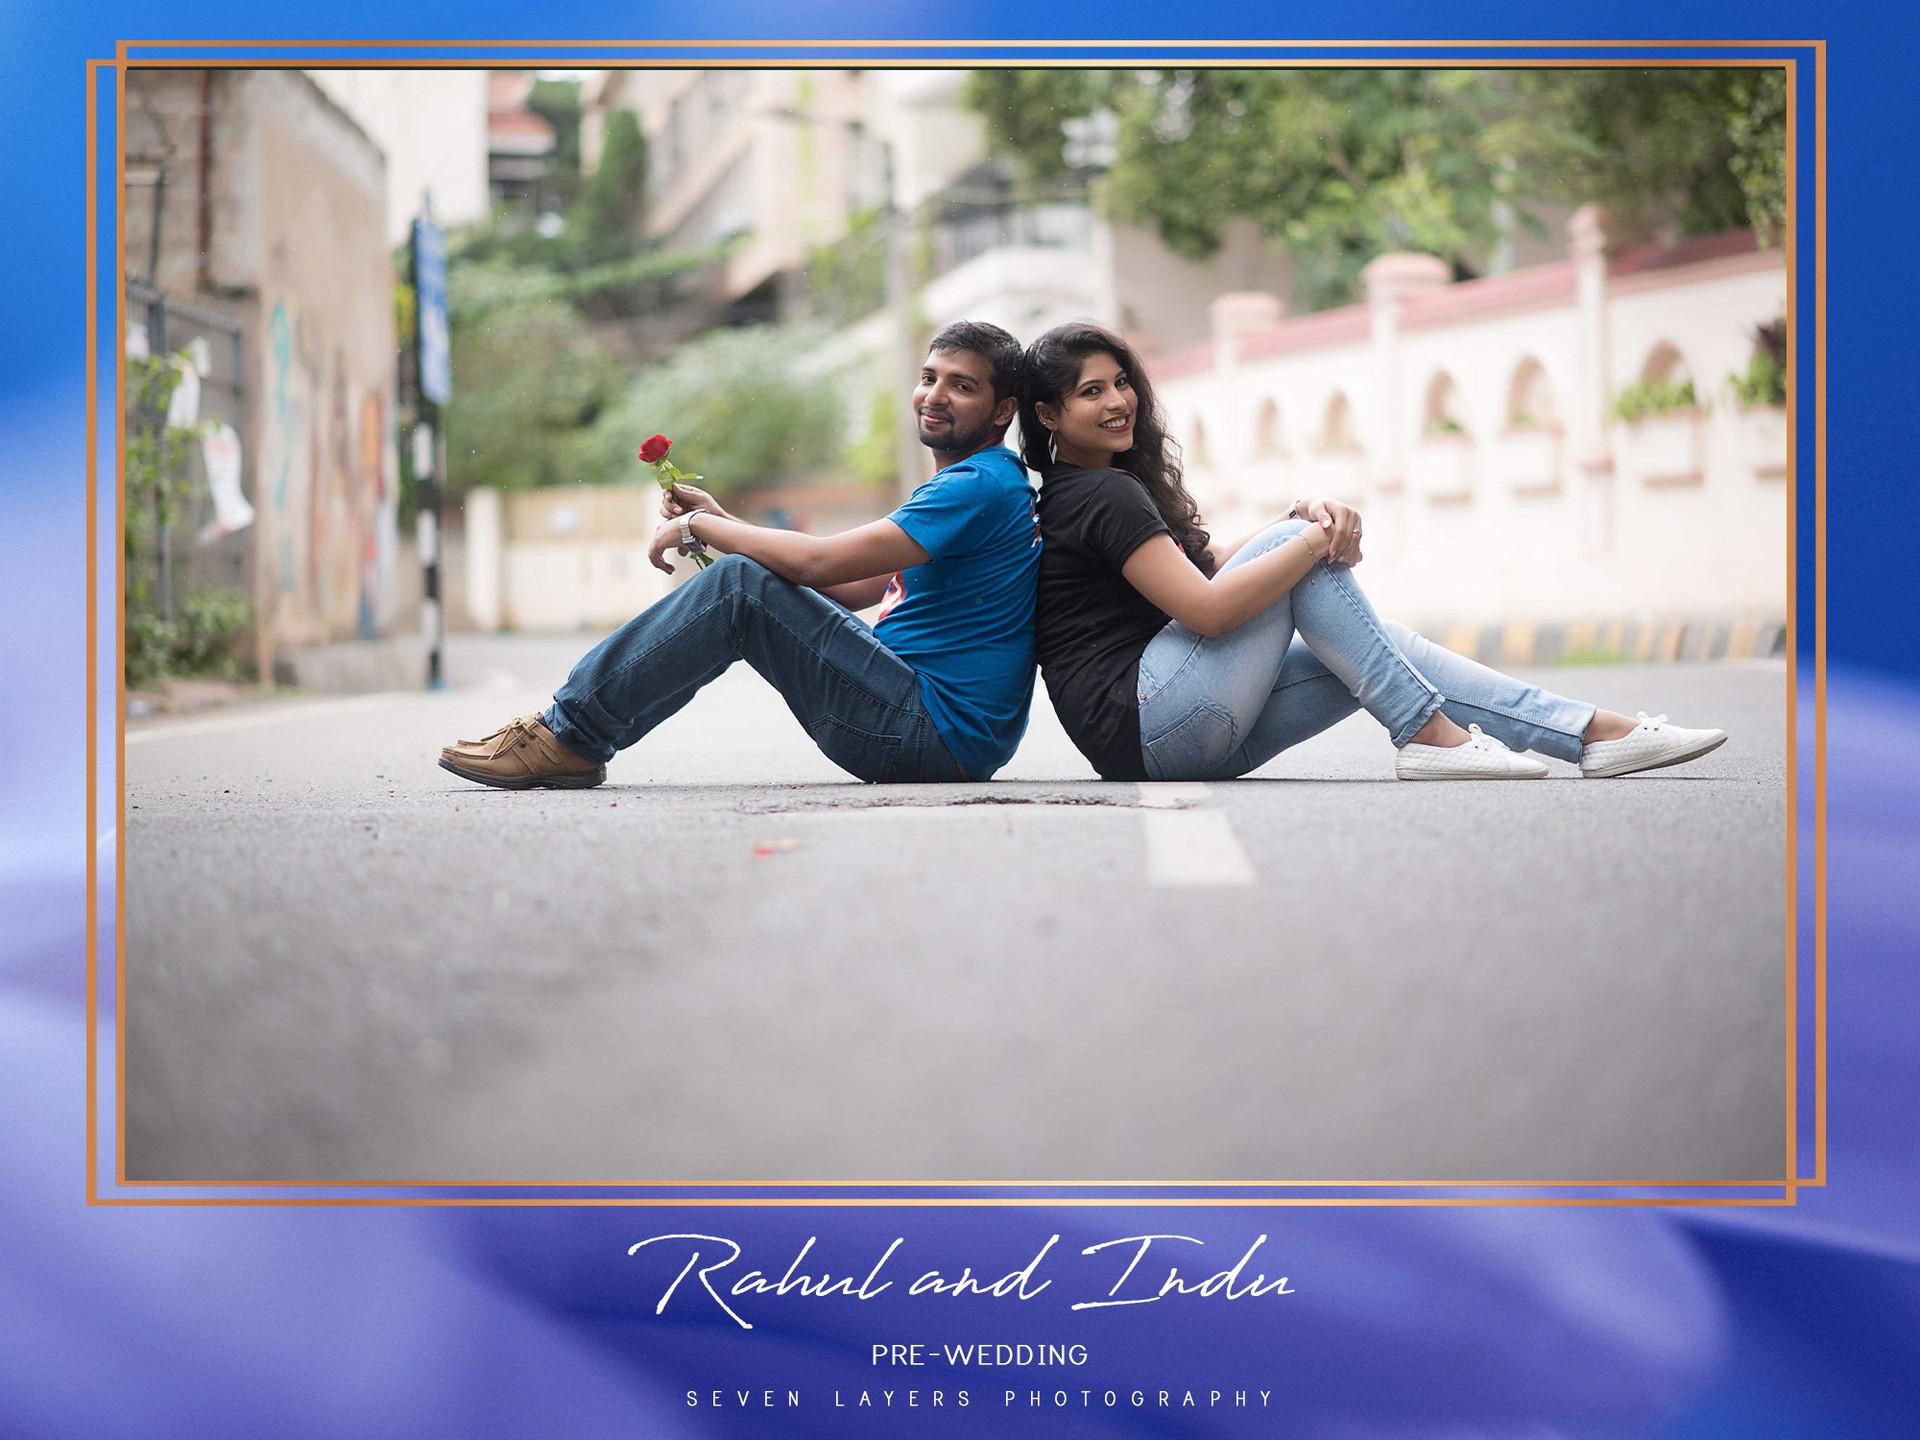 Pre-Wedding_Pose_rahul_Seven Layers Photography (14)